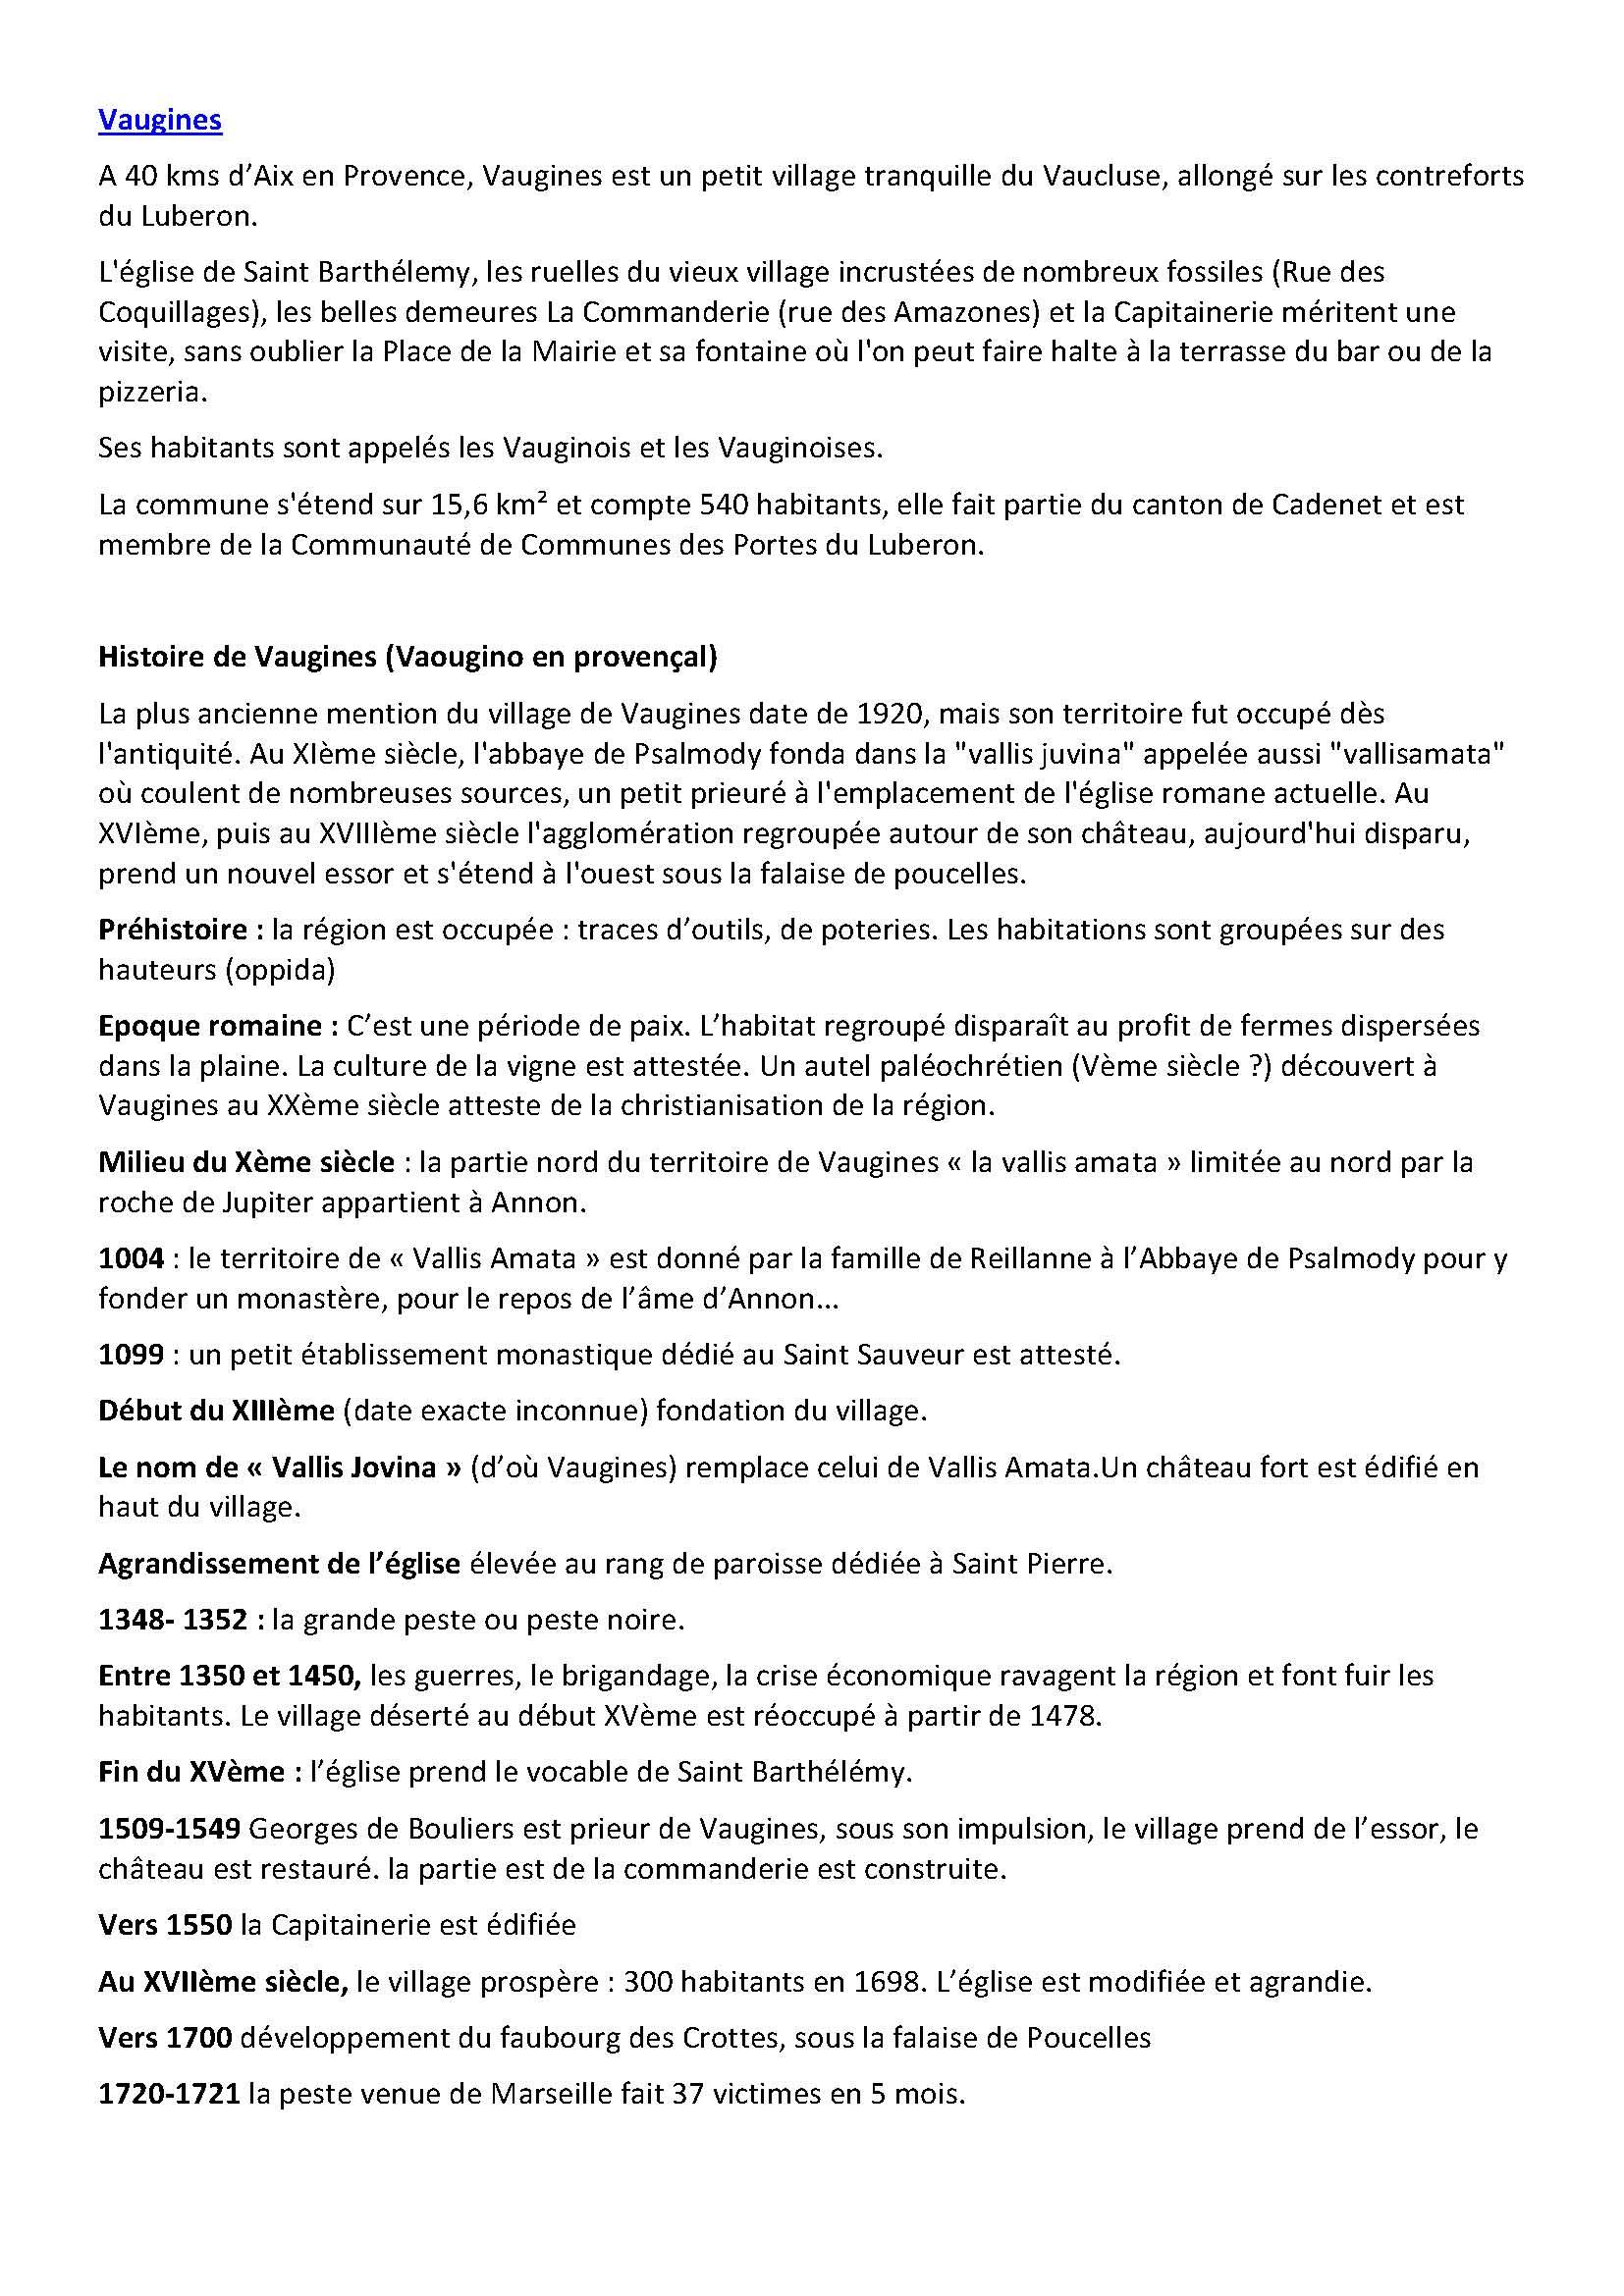 Histoire Vaugines site aep_Page_1